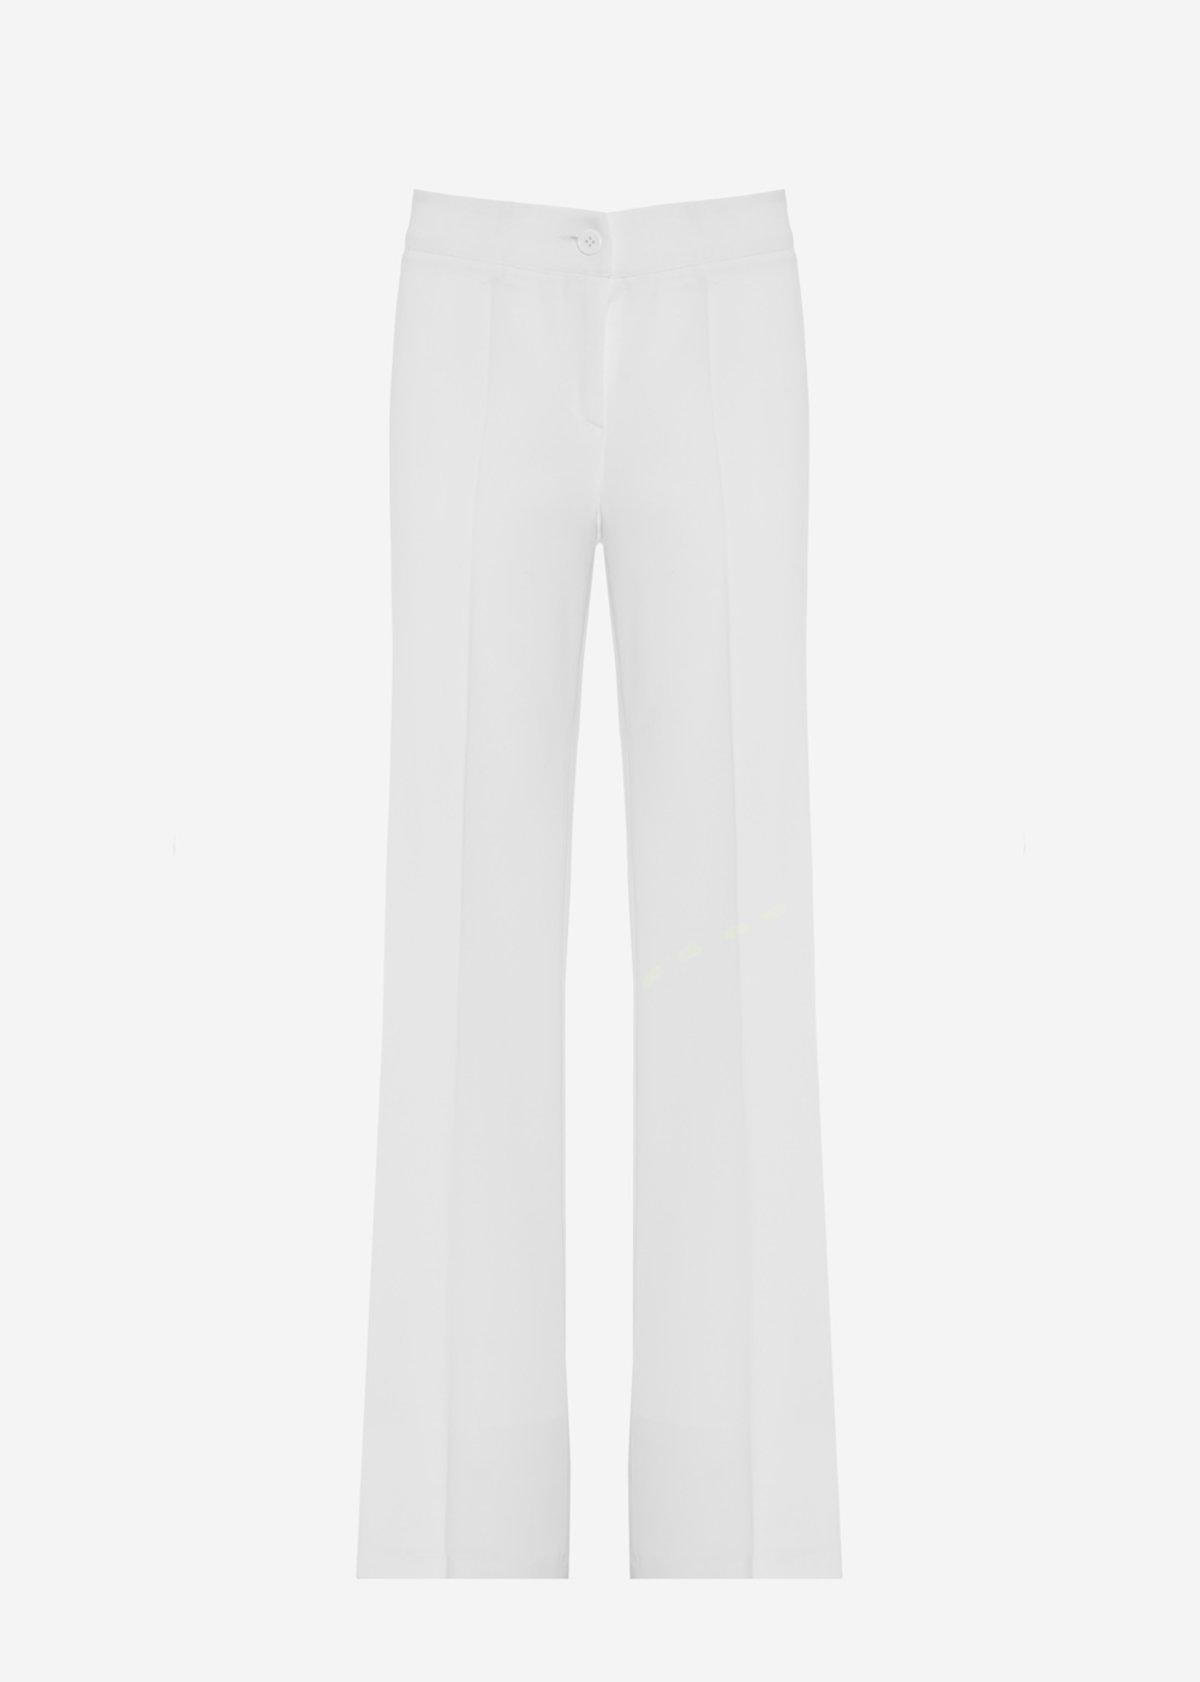 Pantaloni Priamo in crepe con gamba larga